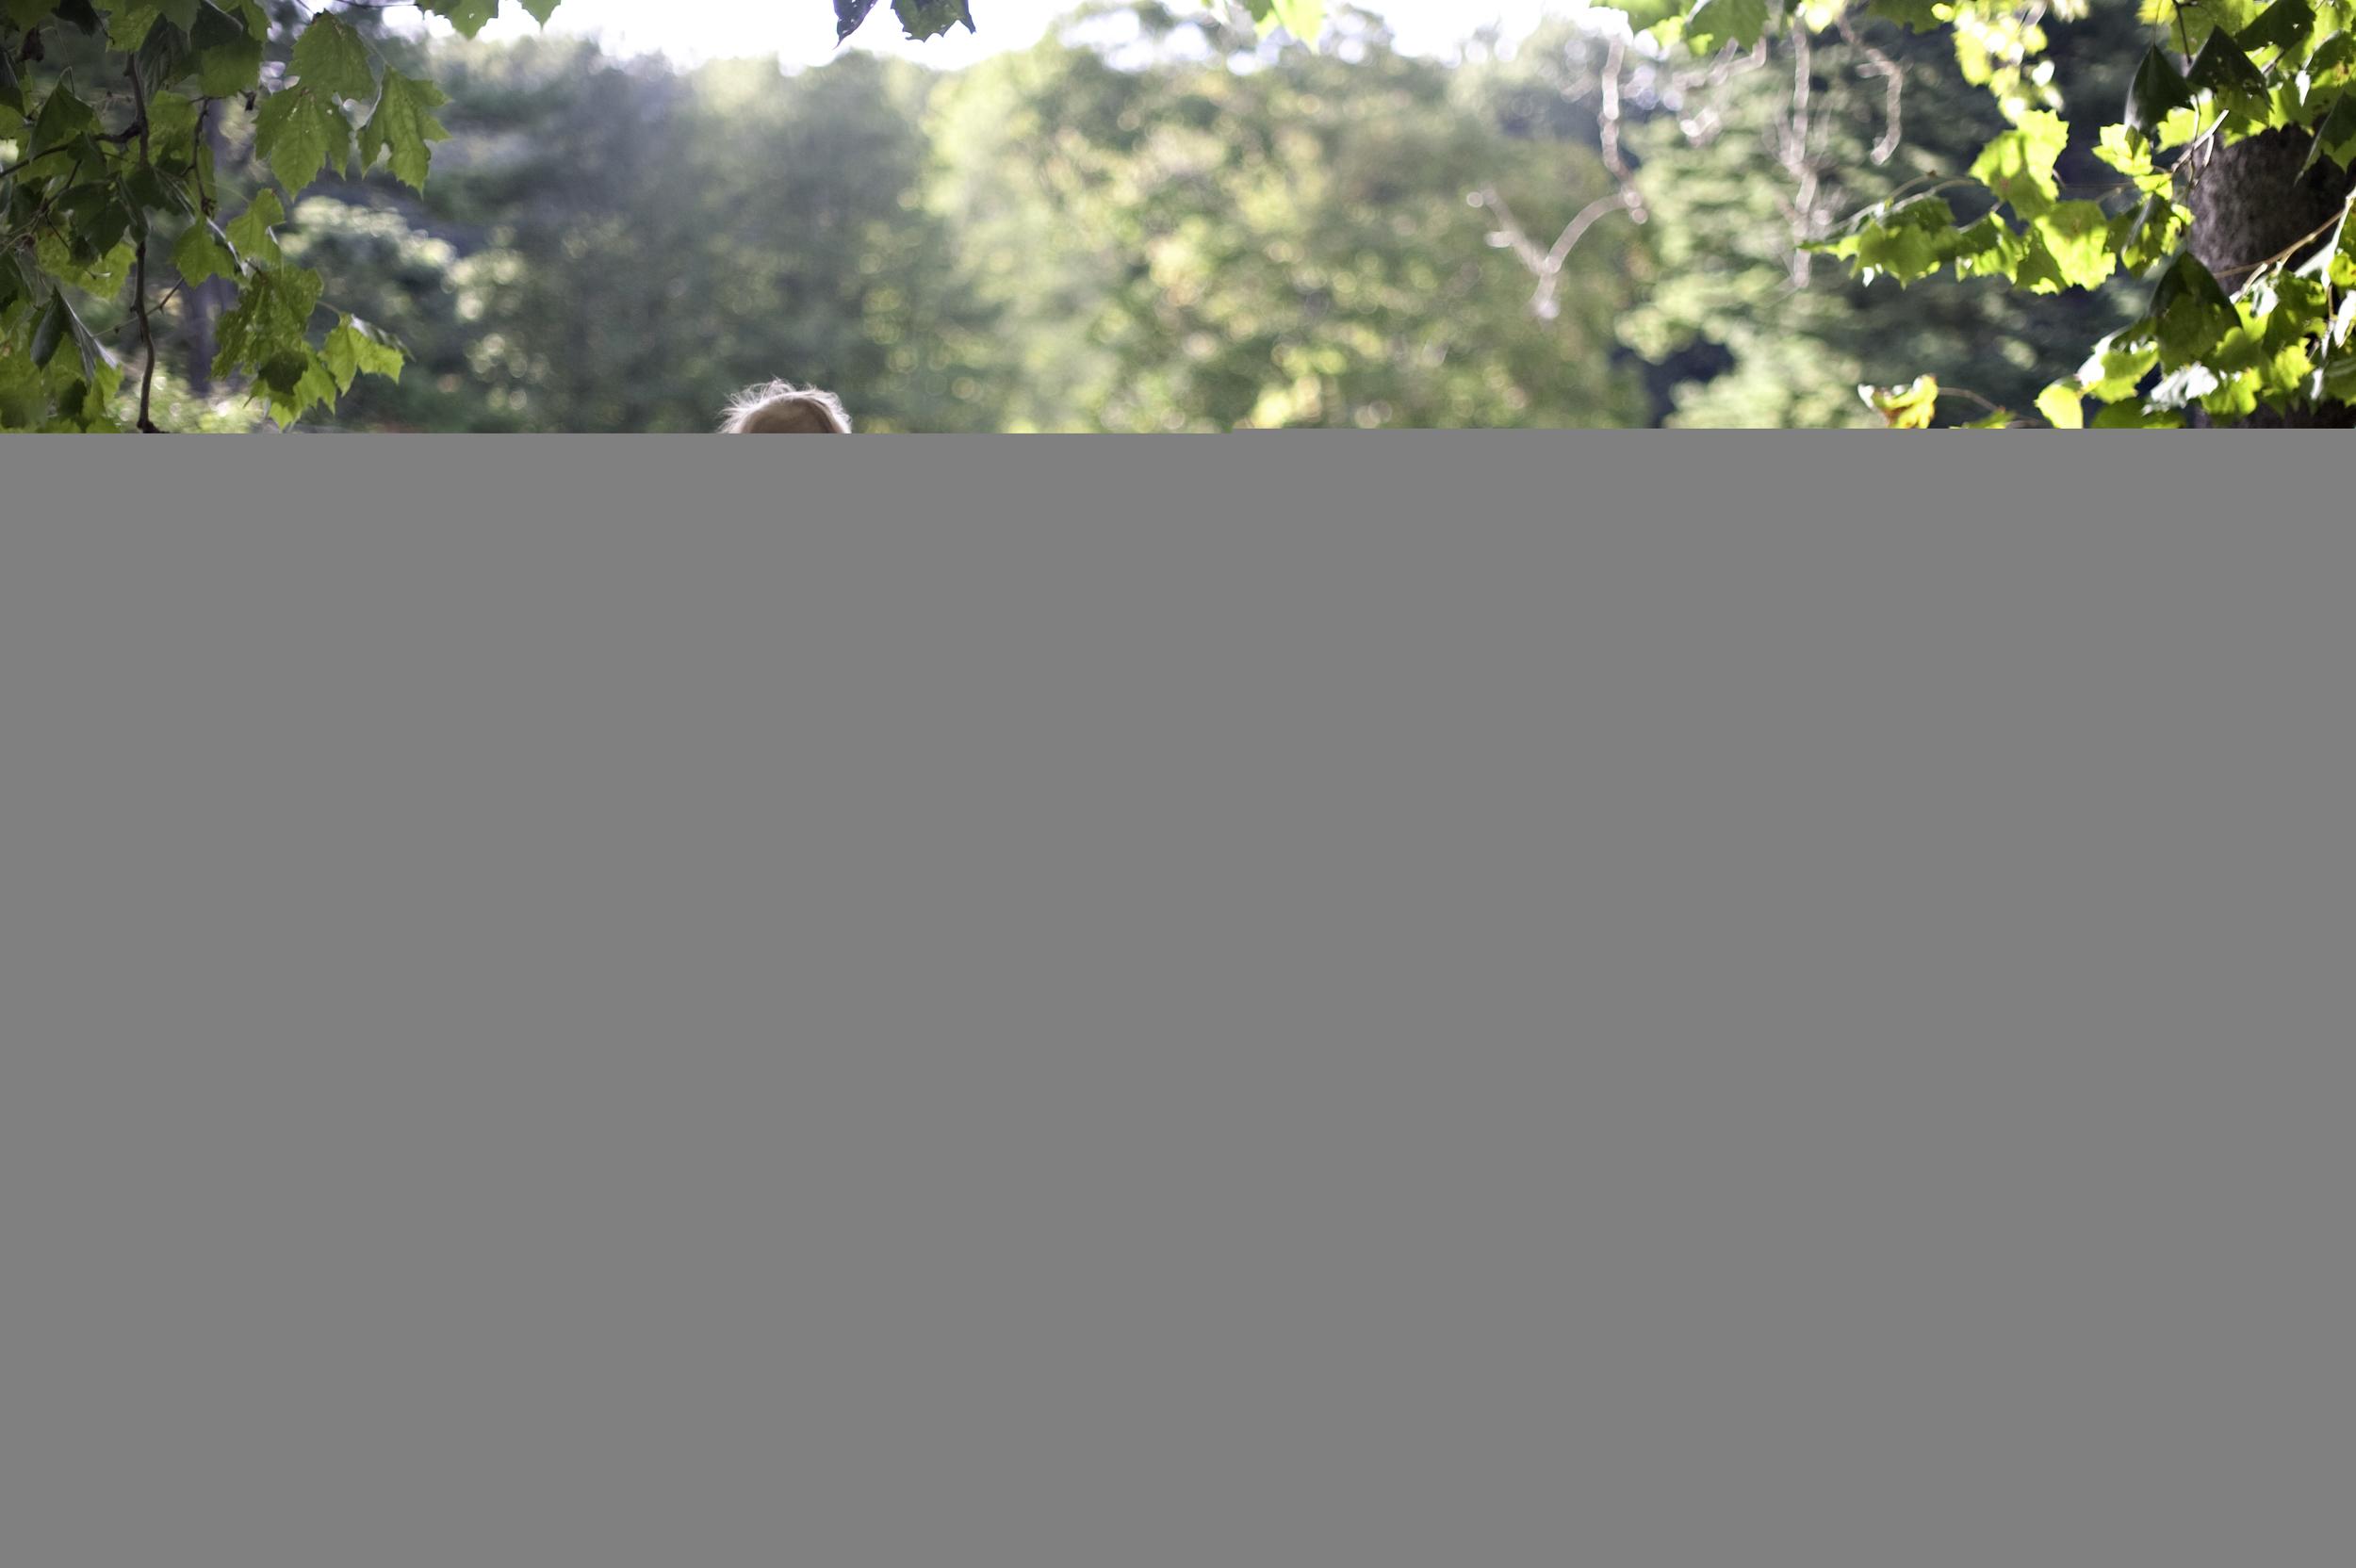 Baltimore Photographer – Baltimore Portrait Photographer – Baltimore Family Photographer – Baltimore Child Photographer – Baltimore Sibling Photographer – Baltimore Natural Light Photographer – Baltimore Lifestyle Photographer – Baltimore Natural Light Portrait Photographer - Maryland Photographer – Maryland Portrait Photographer – Maryland Family Photographer – Maryland Child Photographer – Maryland Sibling Photographer – Maryland Natural Light Photographer – Maryland Lifestyle Photographer – Maryland Natural Light Portrait Photographer - Robyn_DSC_9374B